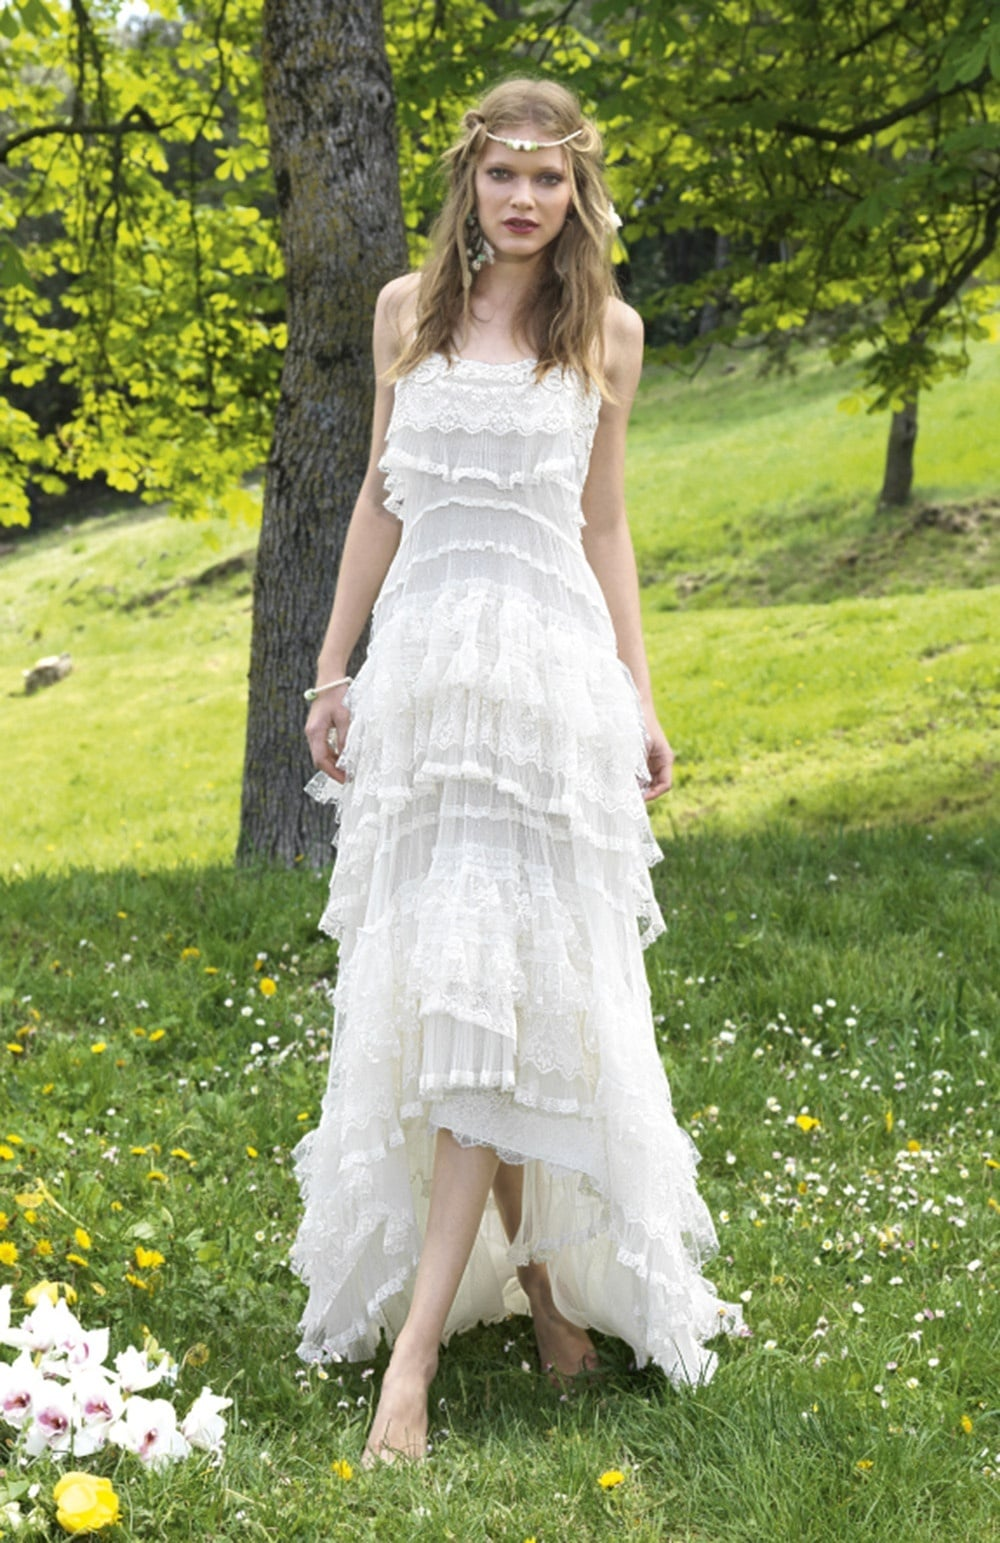 Robe de mariée Modèle Nicol – 899 €